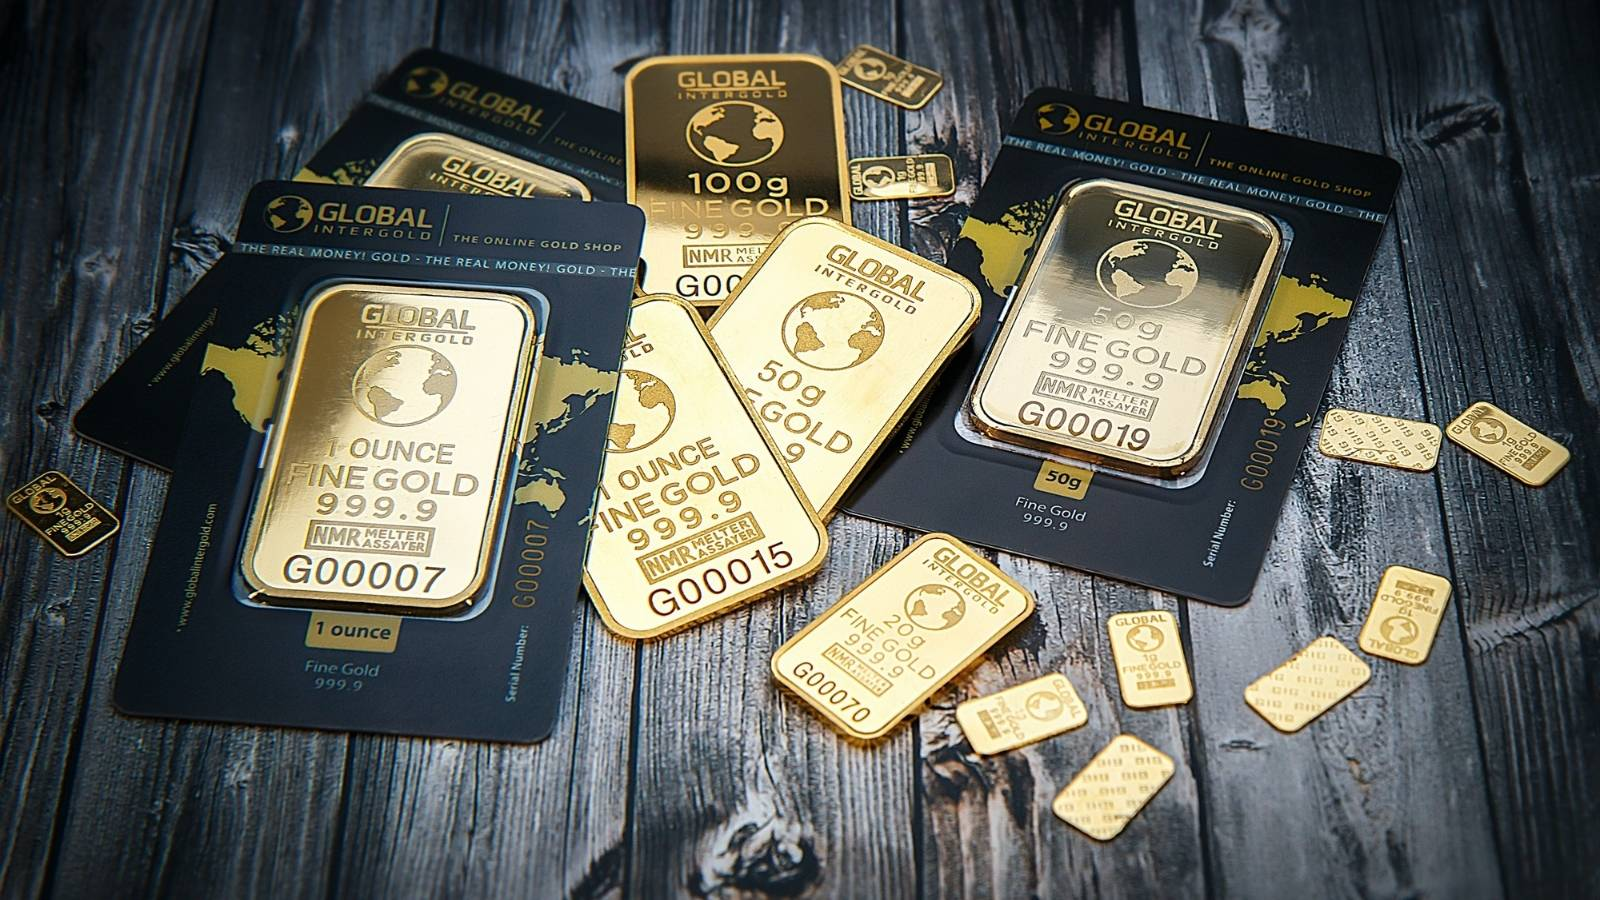 Gold bullion bars of various sizes on a wooden floor